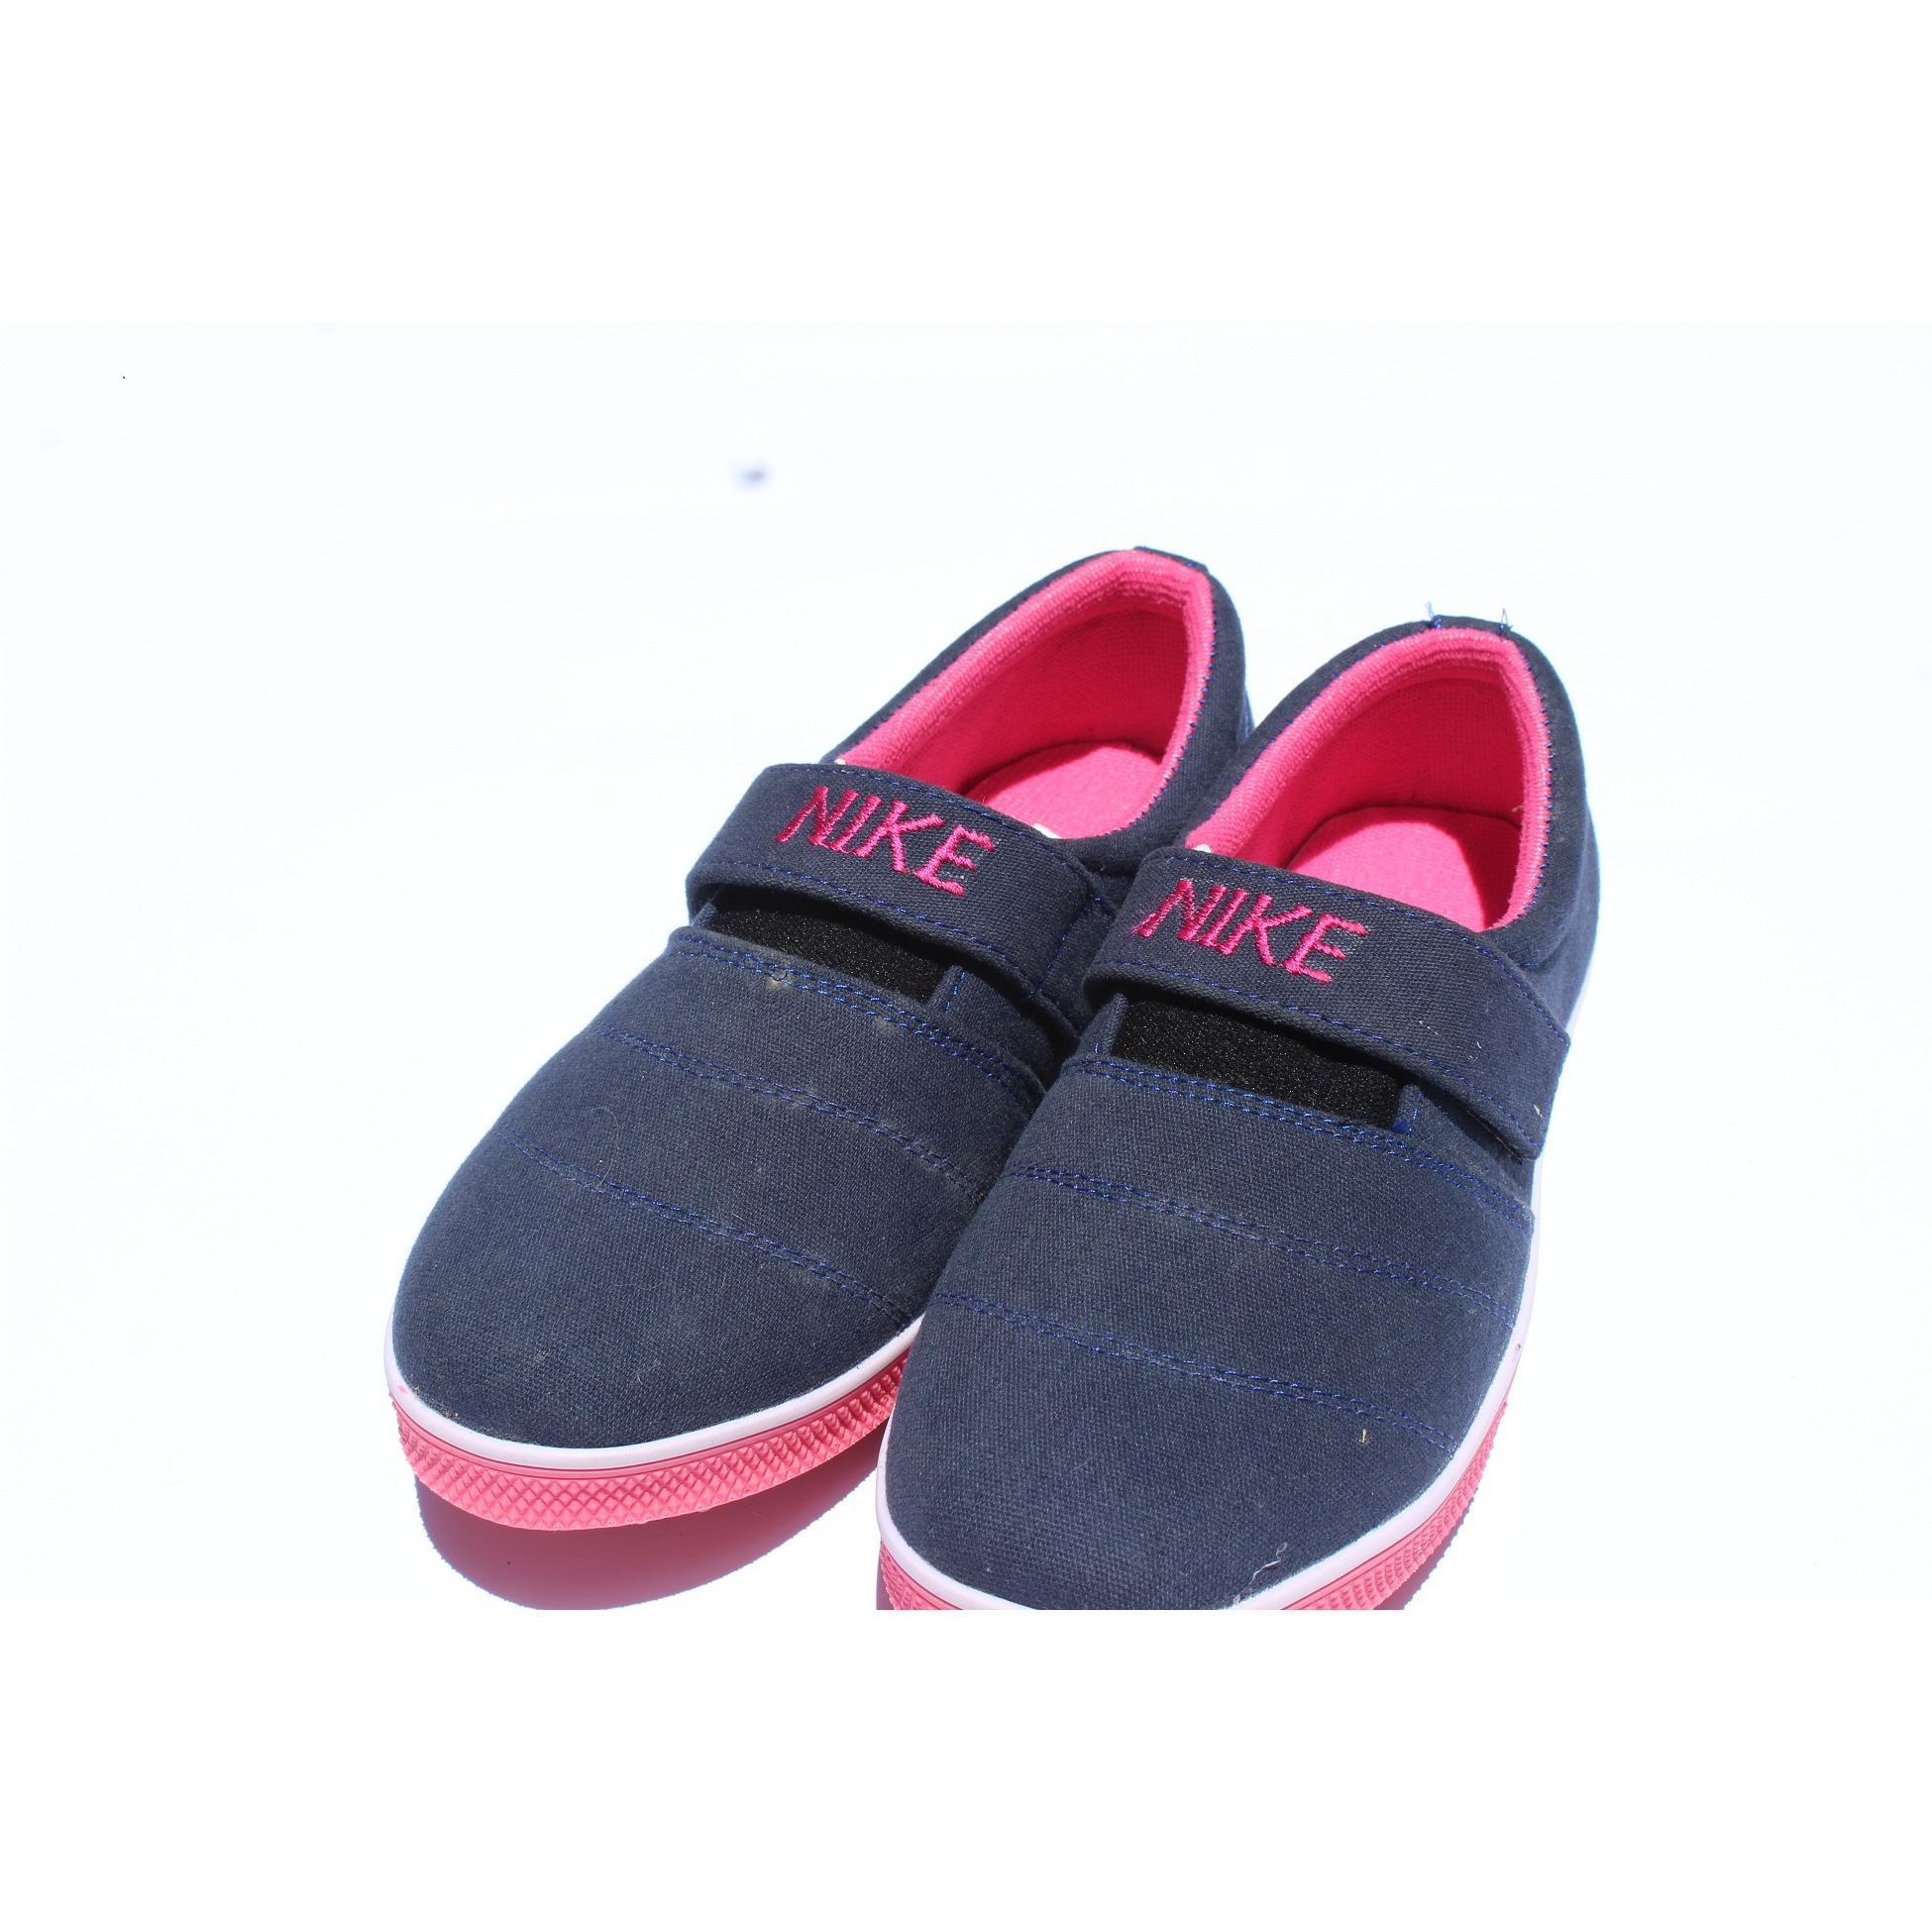 ... HAVANA Shoes Sepatu Sneakers Kets Fashion Wanita Trendy Casual Promo  Kekinian Terlaris Modern Terkini Terbaru Murah 6949af4b5b